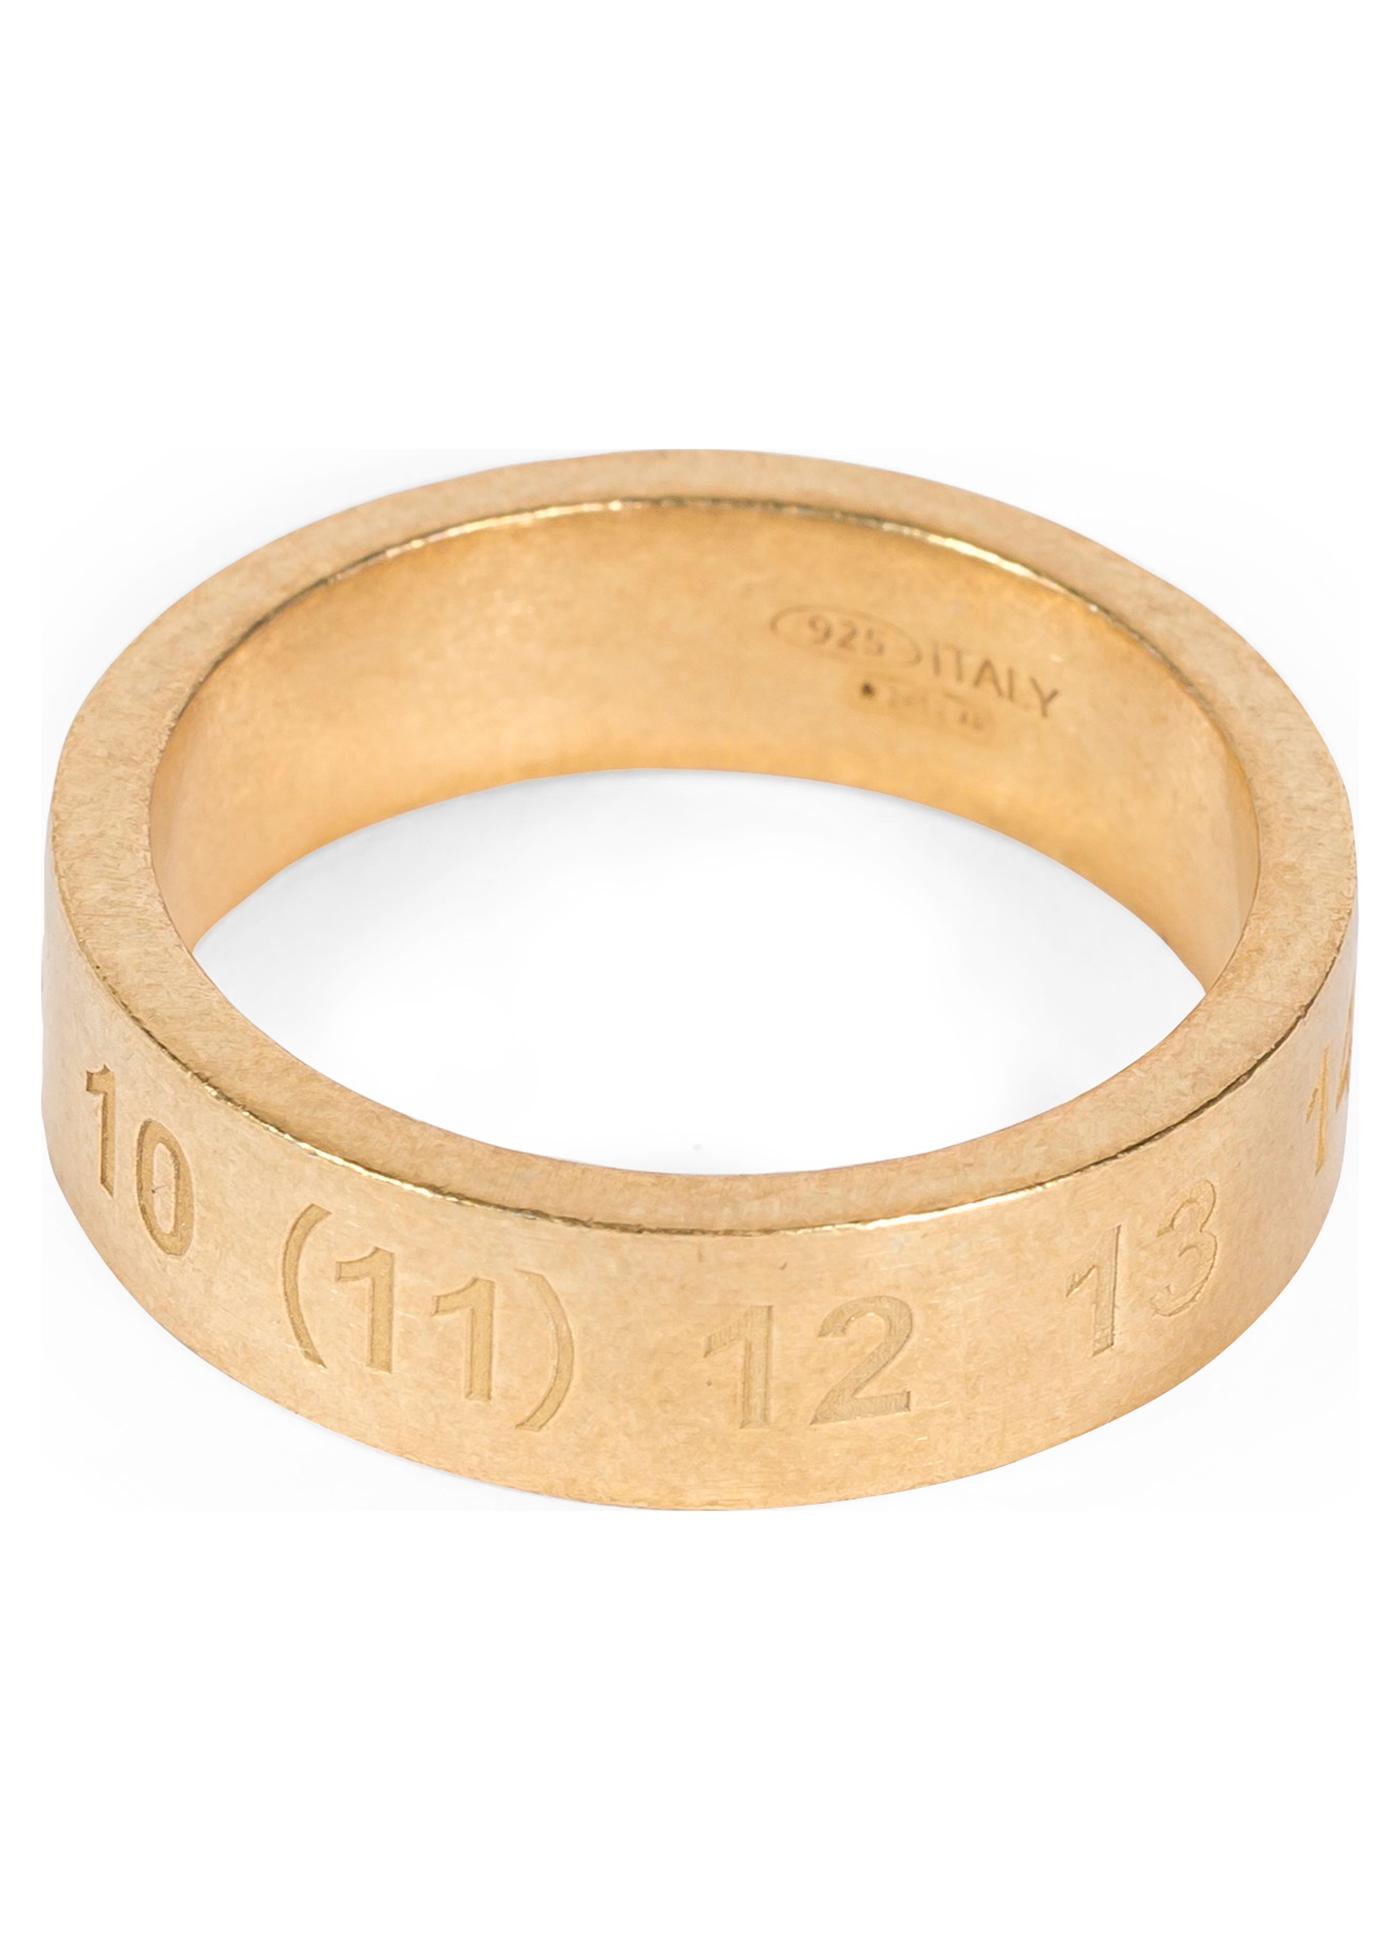 RING image number 0